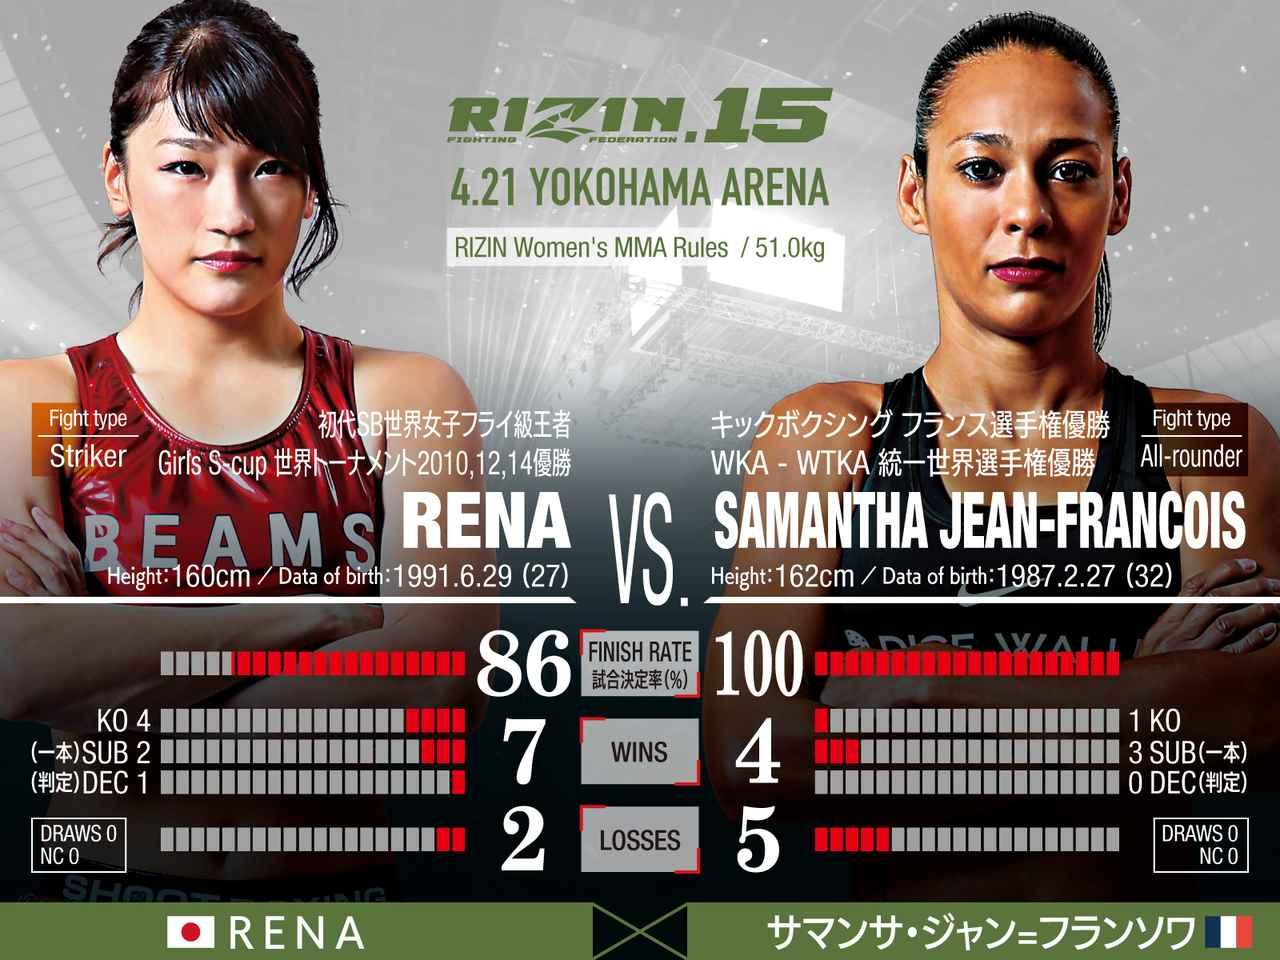 画像: RIZIN 女子 MMA ルール : 5分 3R(51.0kg)※肘あり